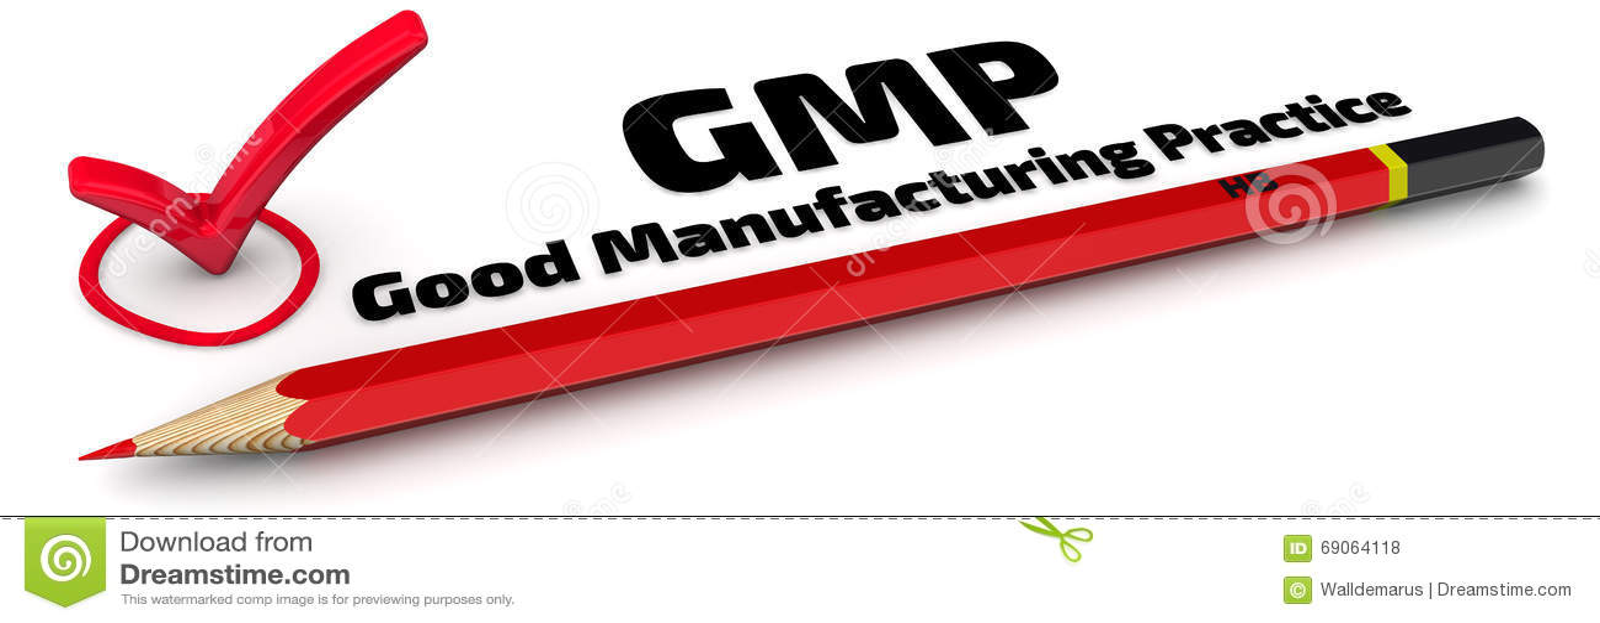 GMP Хорошая практика производства Метка